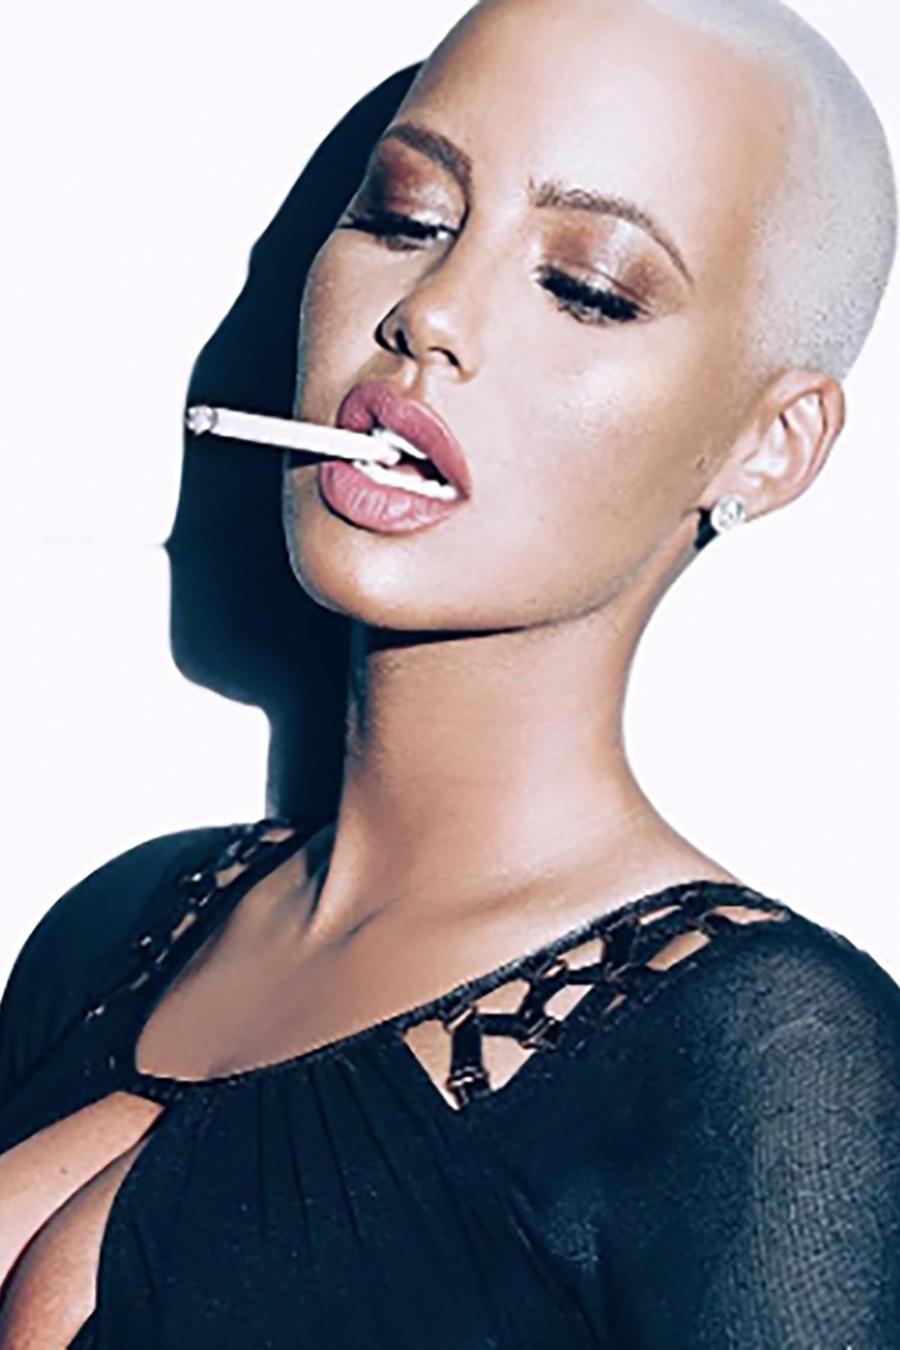 Amber Rose fumando